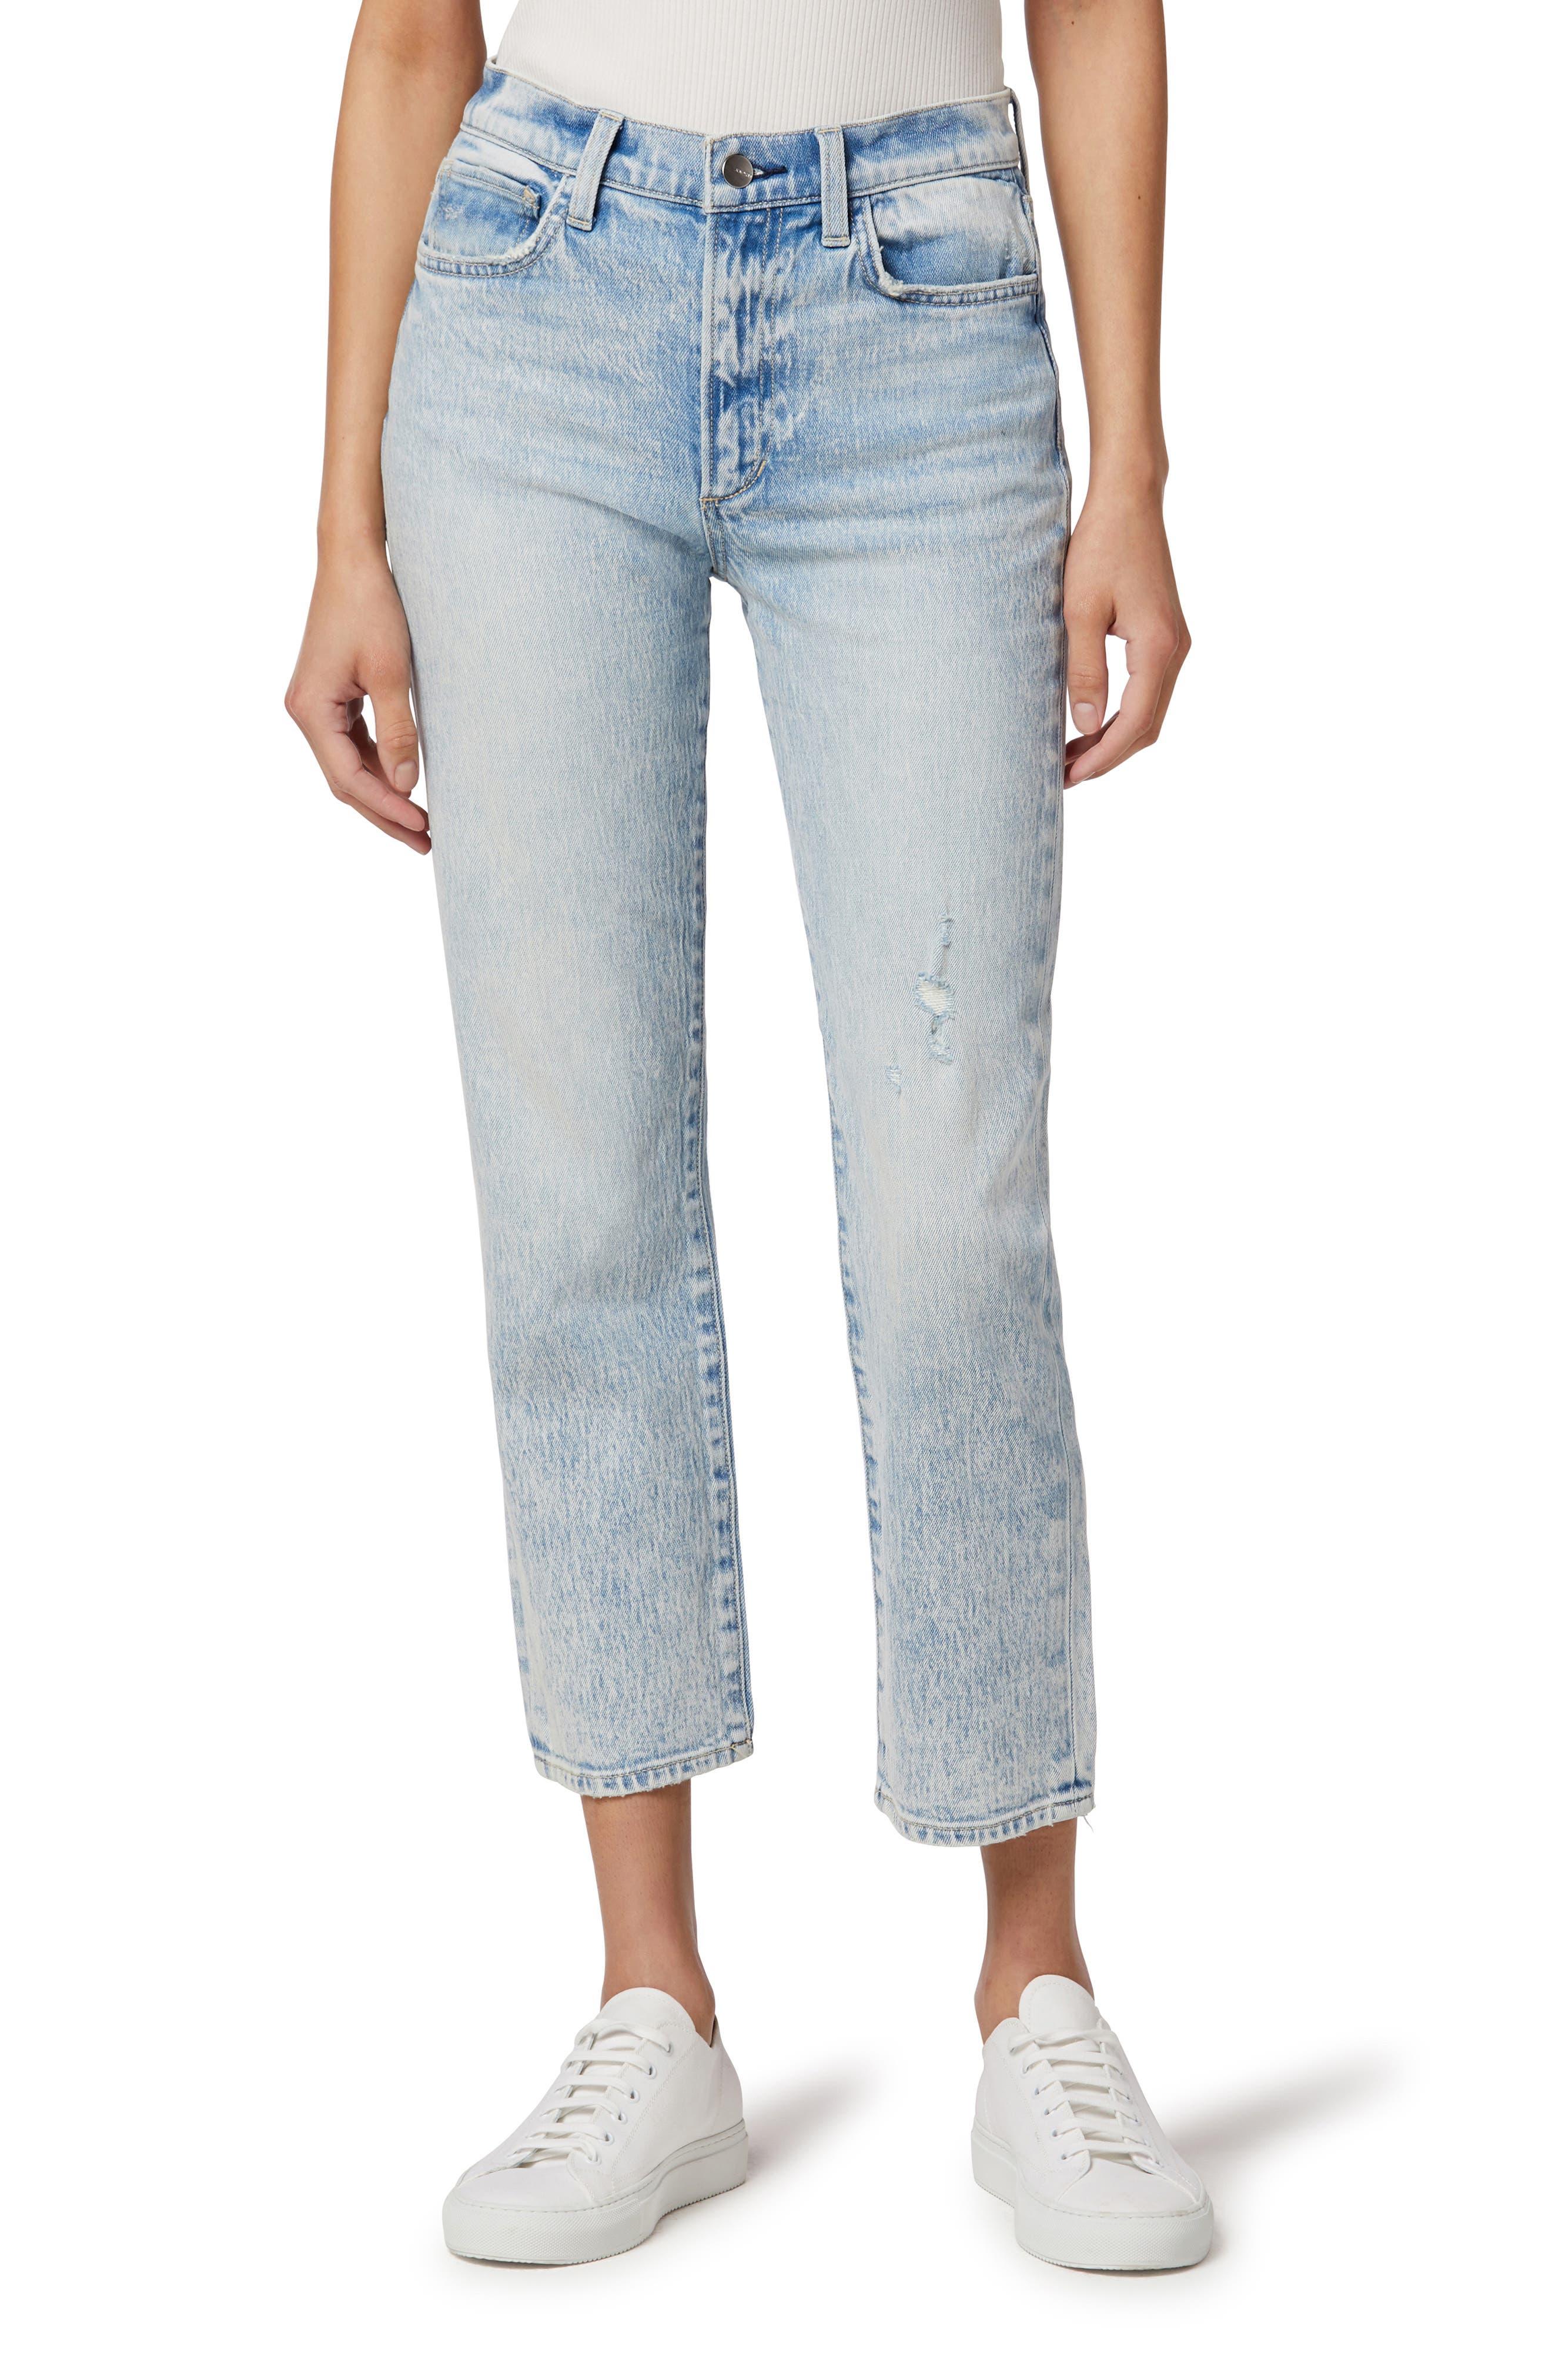 The Luna Distressed High Waist Crop Slim Jeans